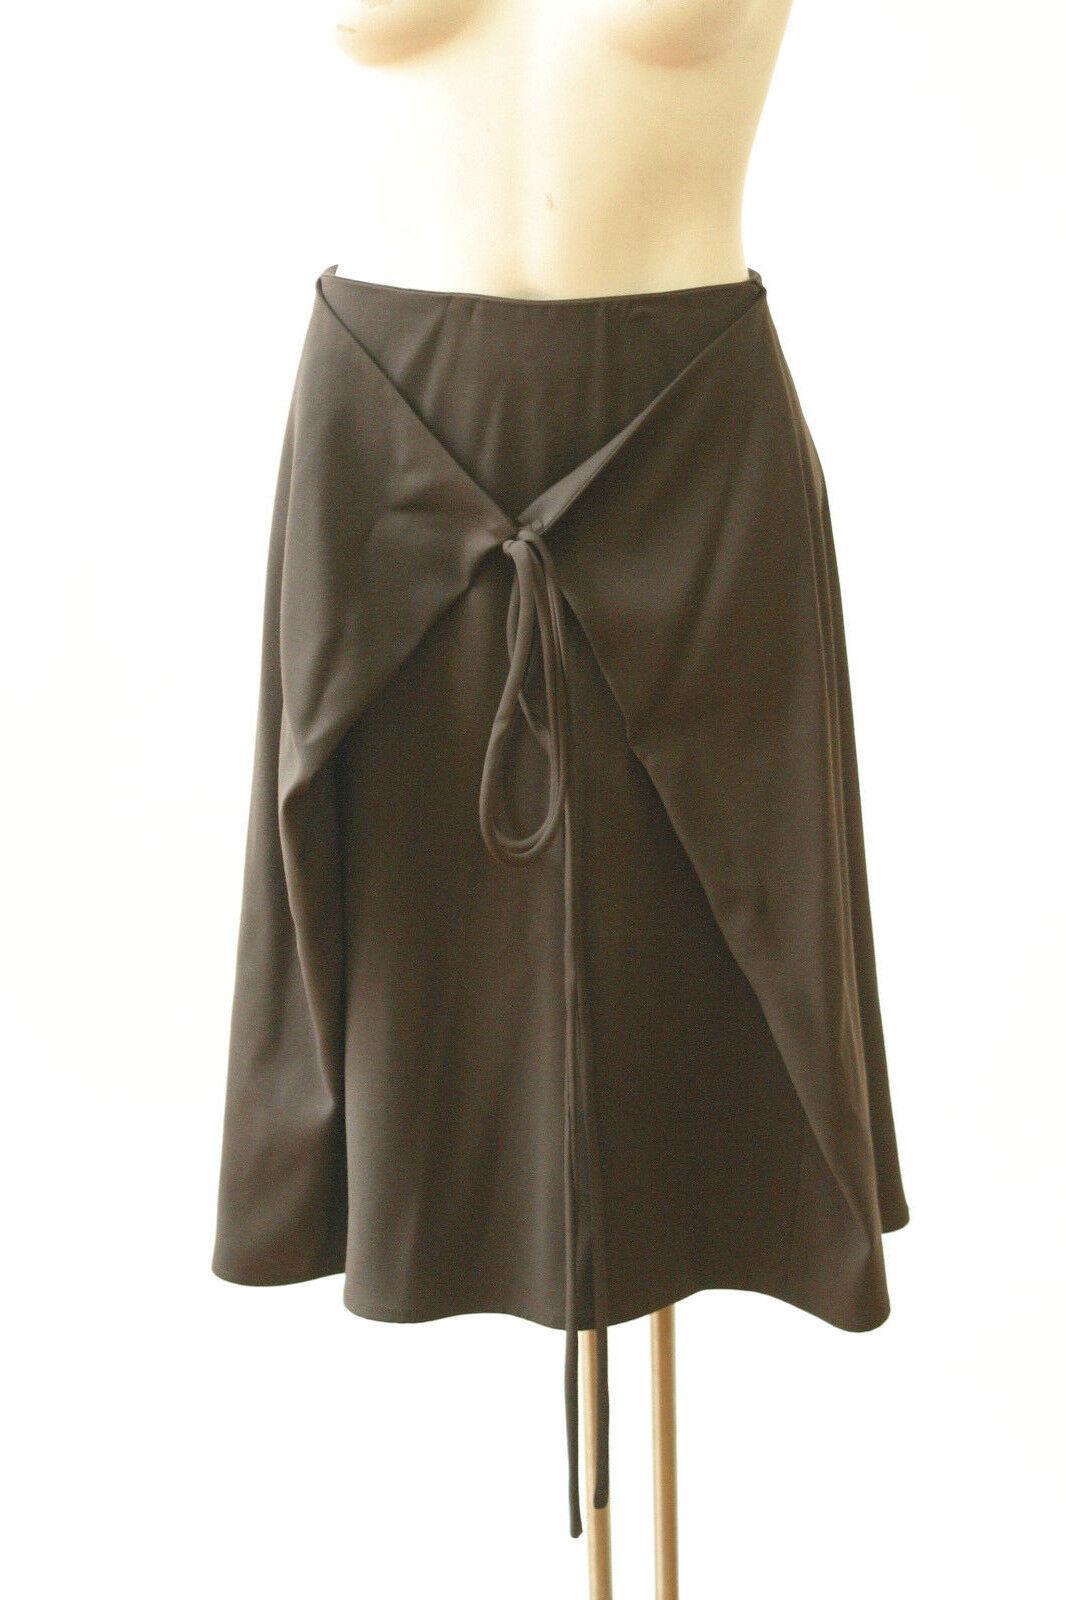 NWOT Gianfranco Ferre Skirt Avant Garde Brown Wool Knee Length 44